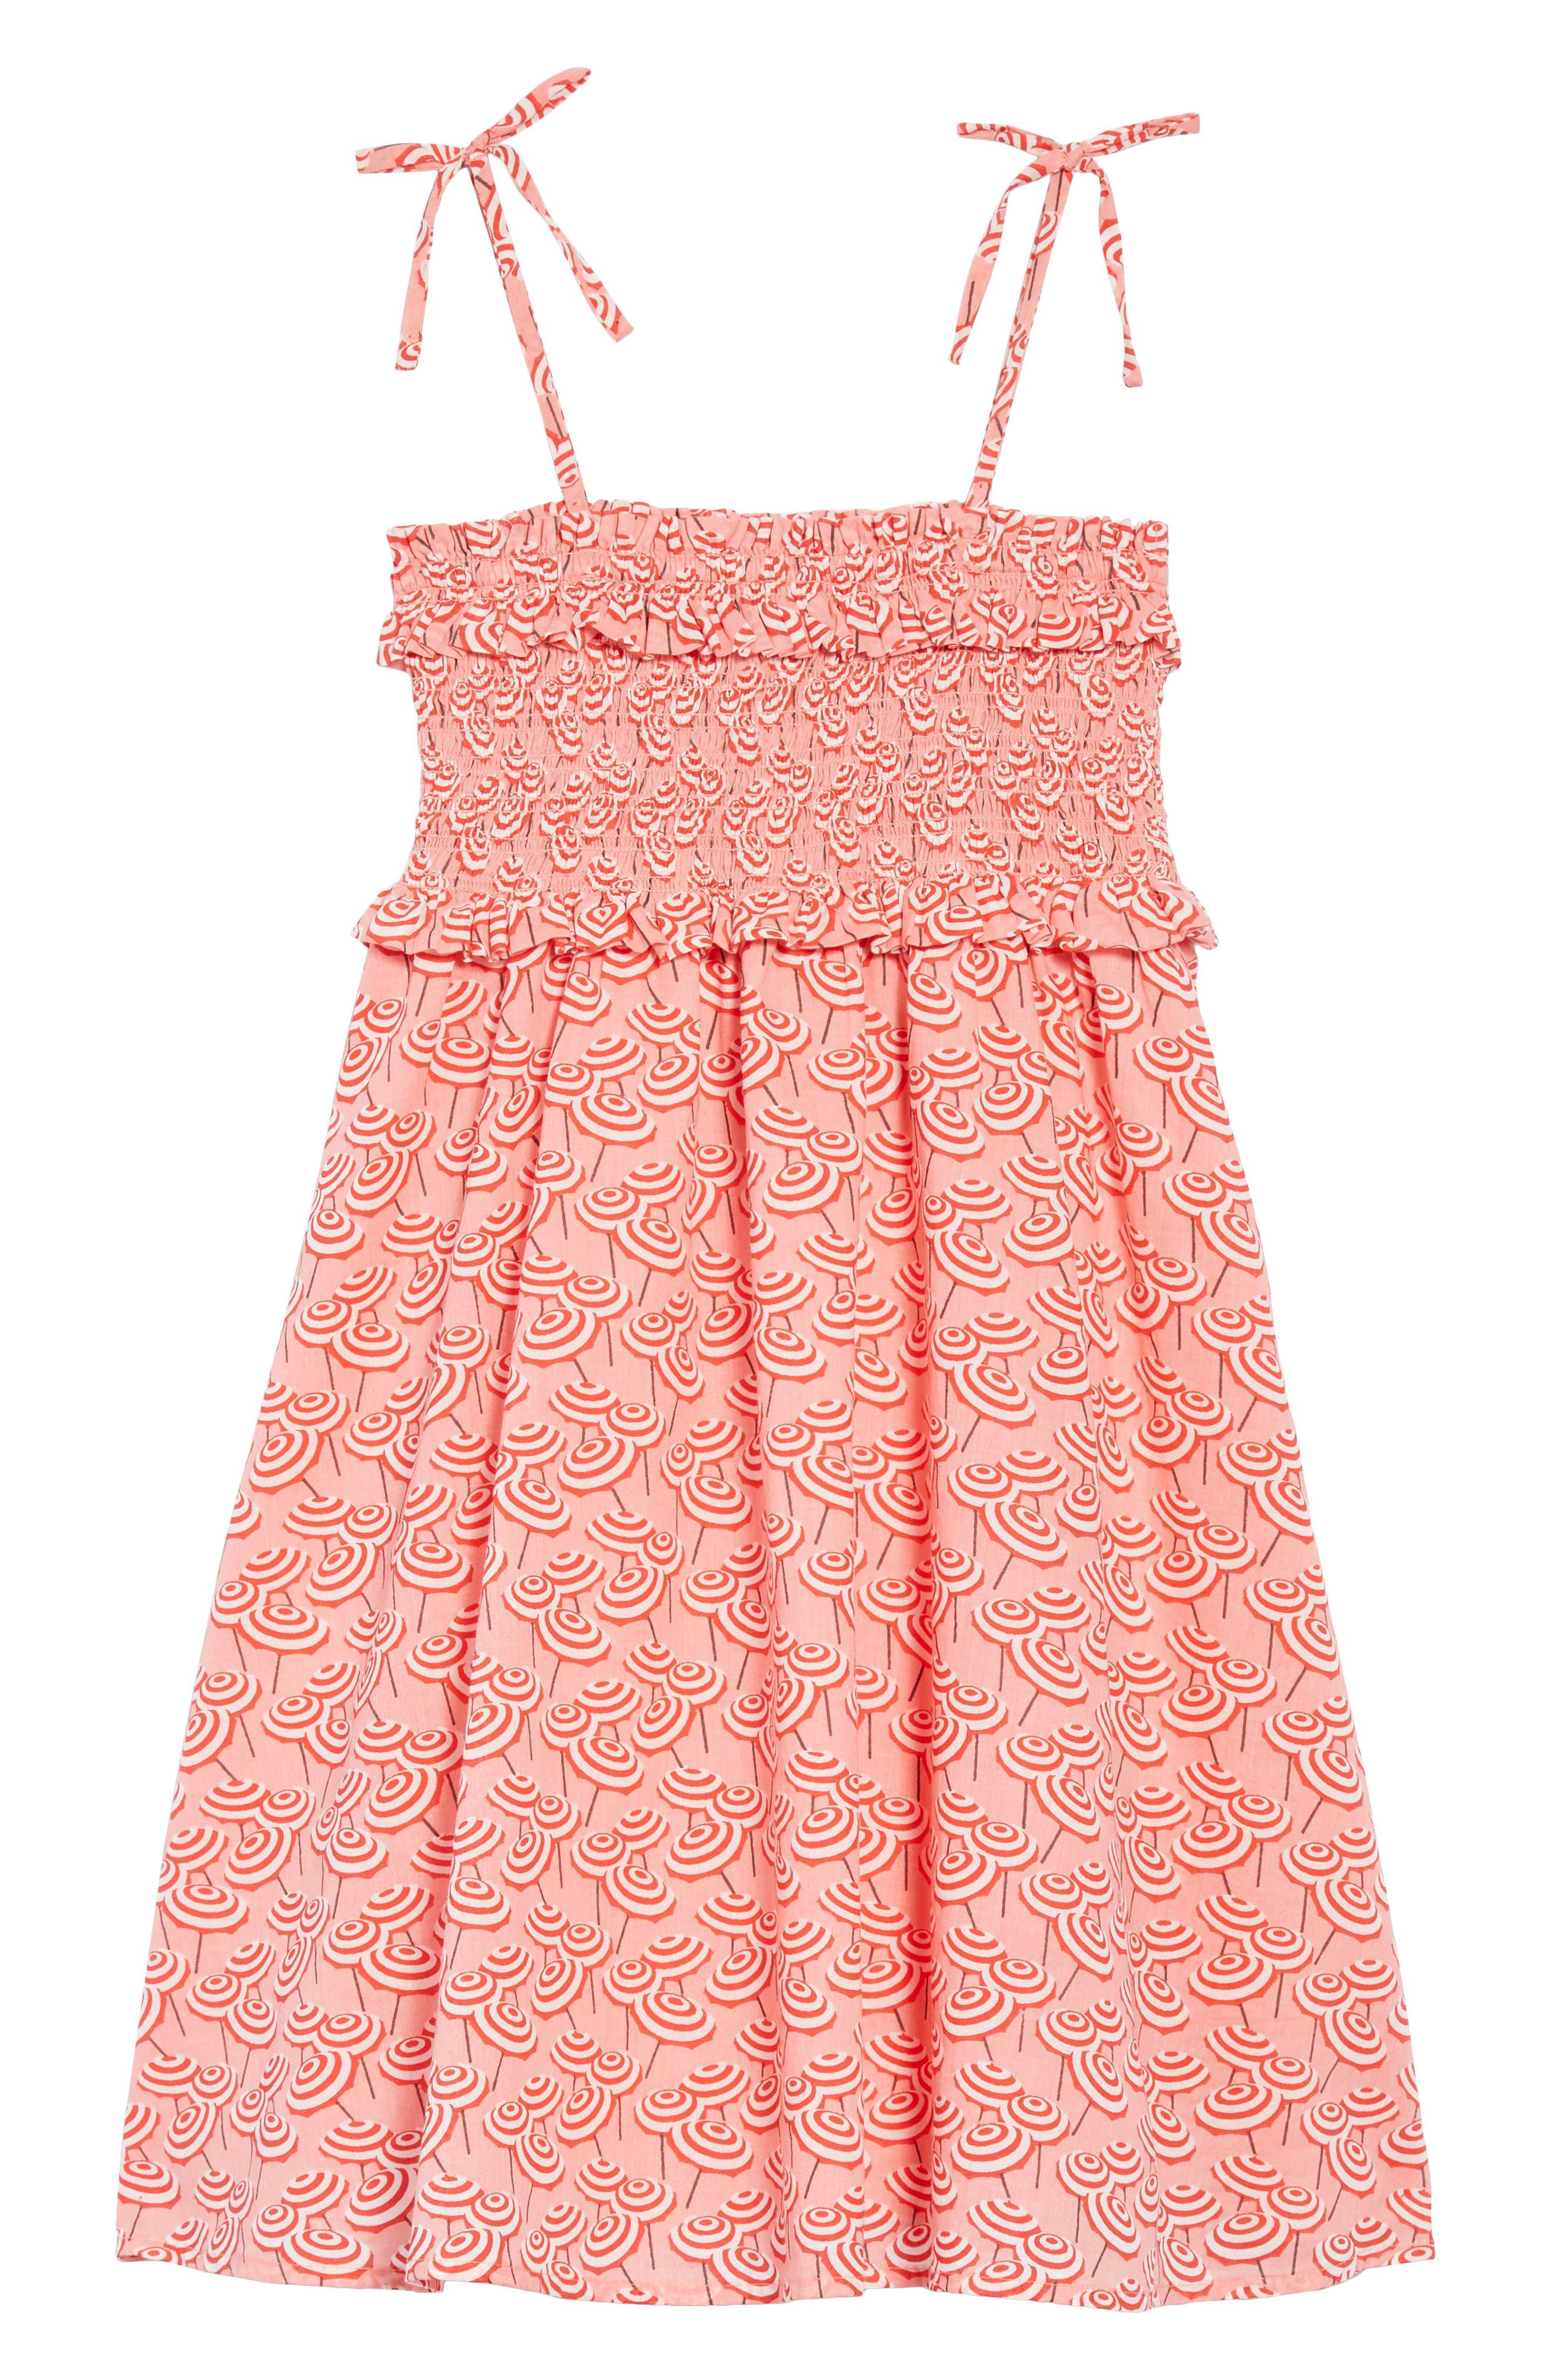 Umbrella Print Smocked Bodice Dress,                             Main thumbnail 1, color,                             600